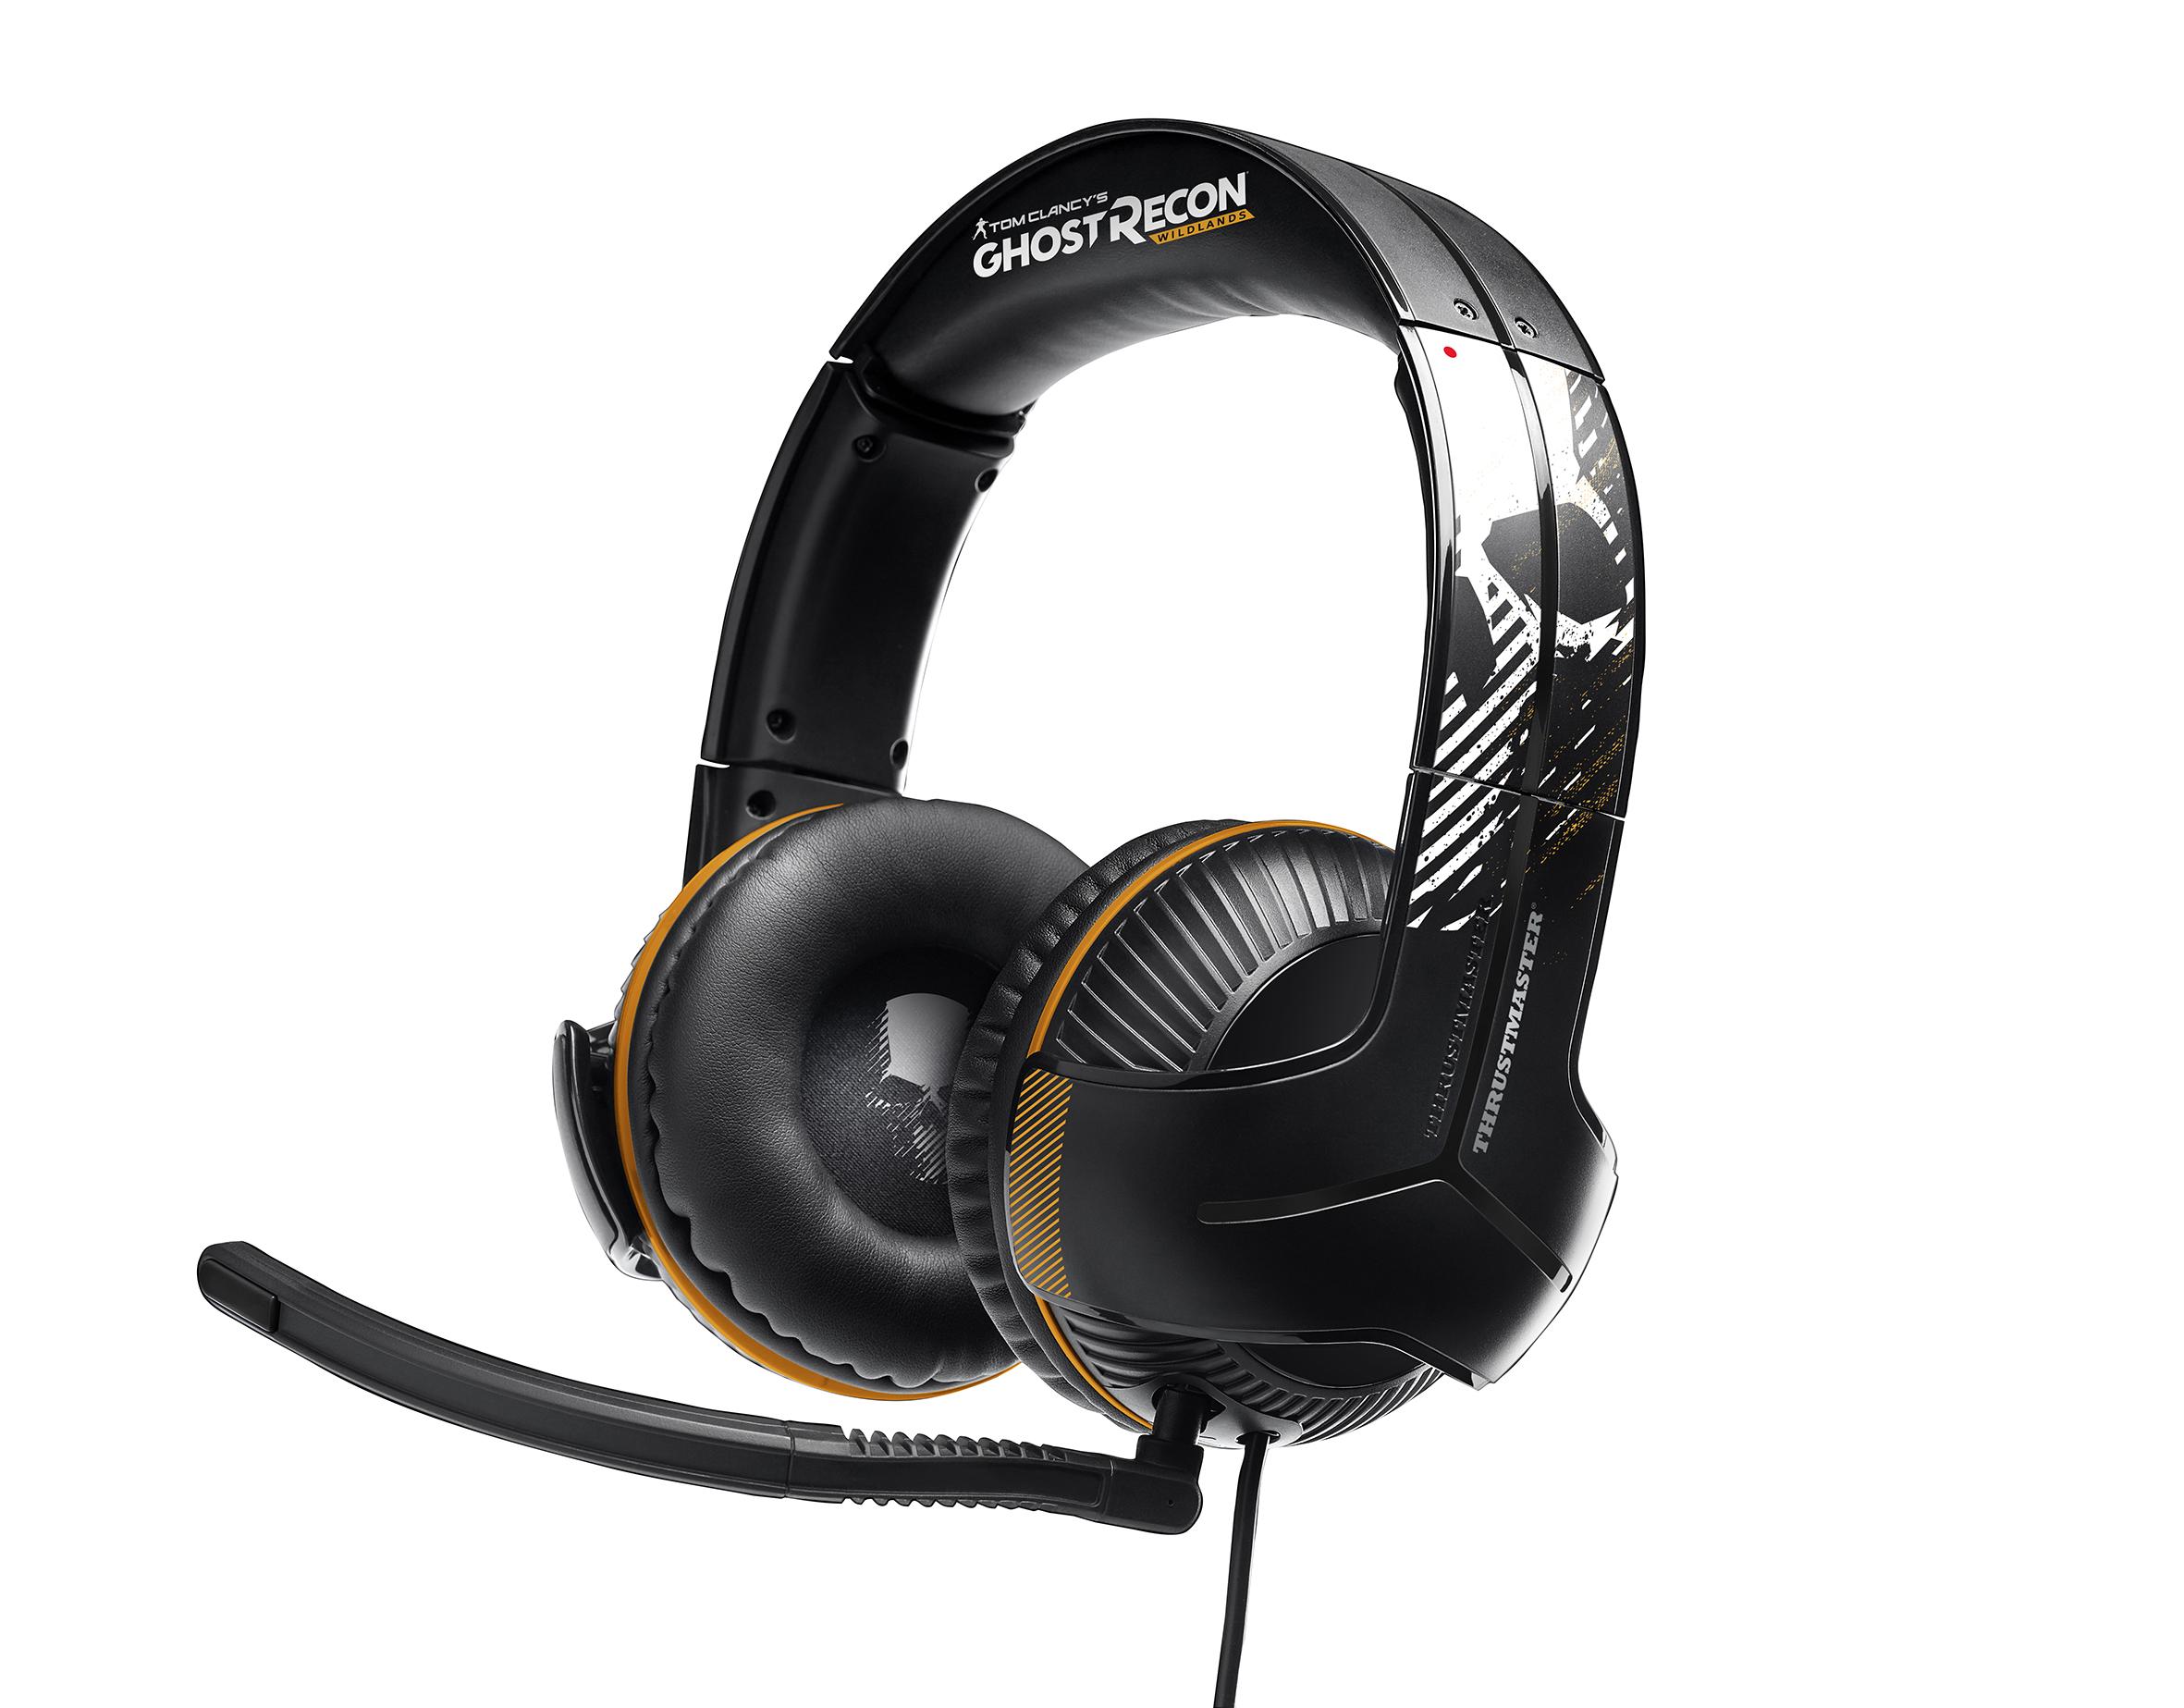 Herní sluchátka s mikrofonem Thrustmaster Y-350P GhostRecon EMEA edice pro PS4